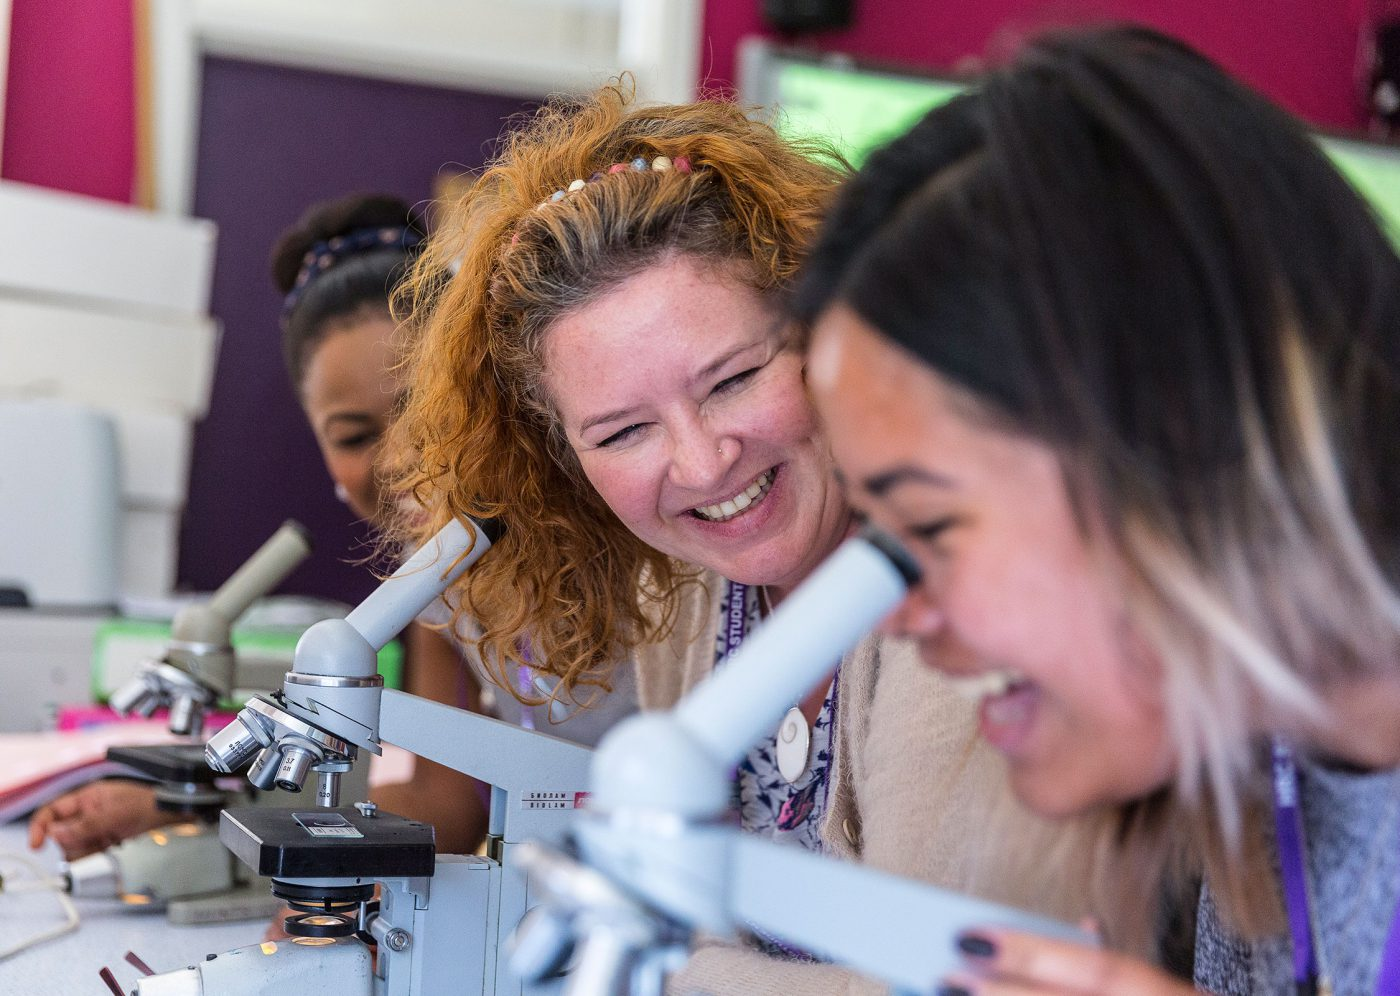 hrc-microscope-classroom